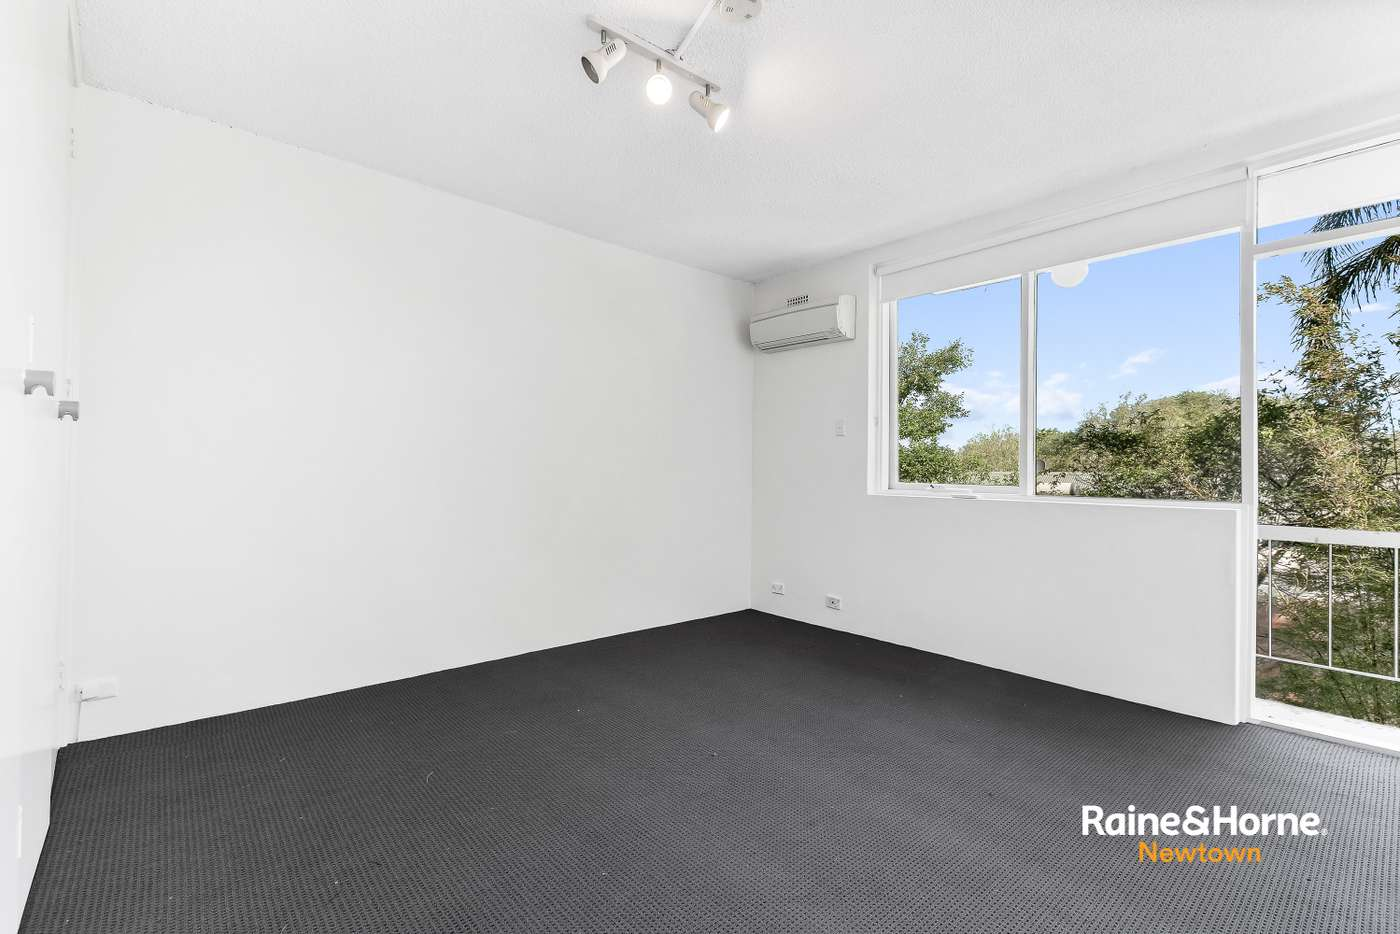 Main view of Homely studio listing, 21/60 Brocks Lane, Newtown NSW 2042